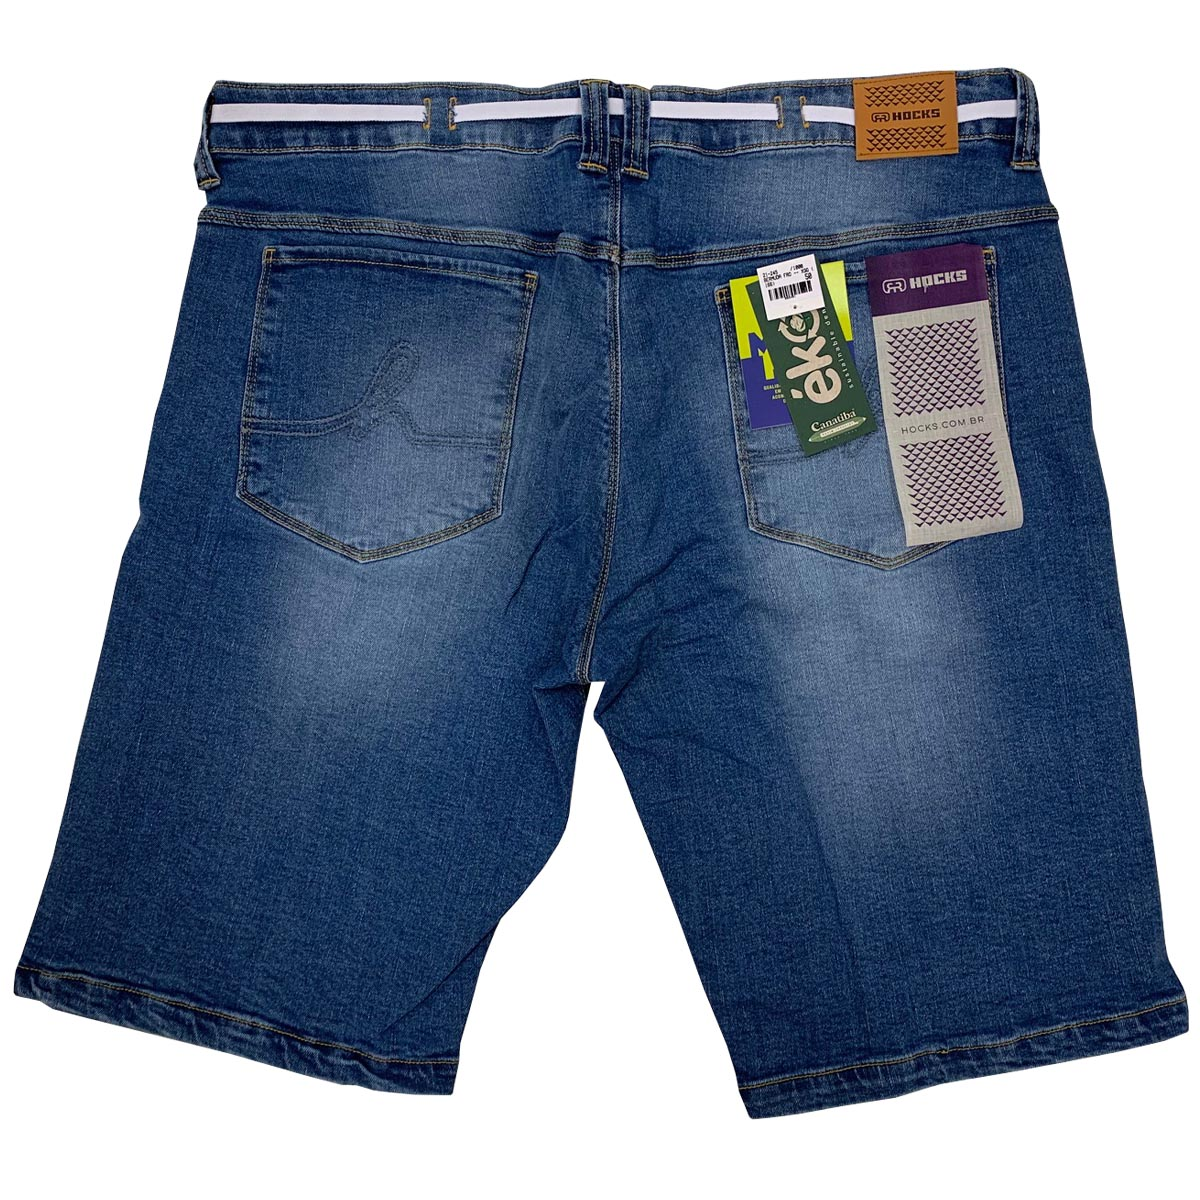 Bermuda Jeans Hocks Tamanhos Grandes 21-245 Masculina